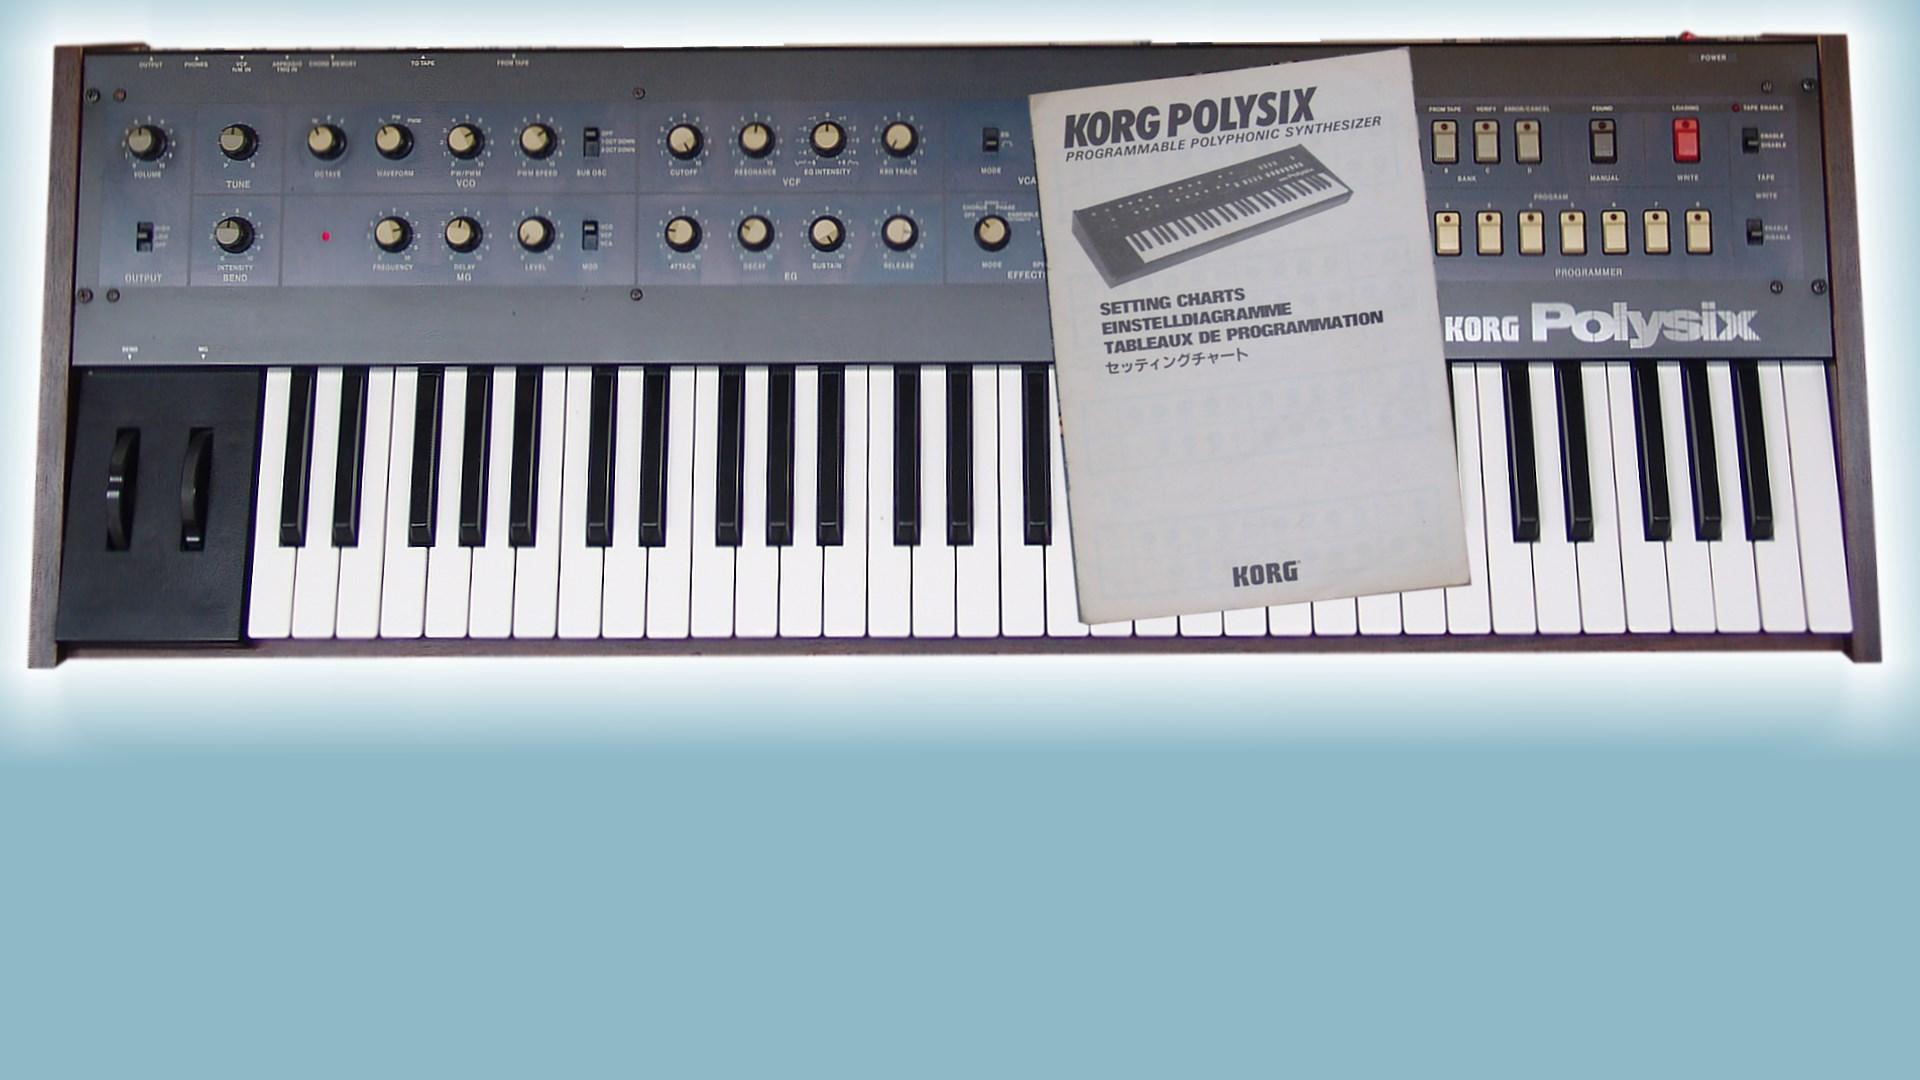 SoundDiviner Patch Sheet Plugin for Korg PolySix